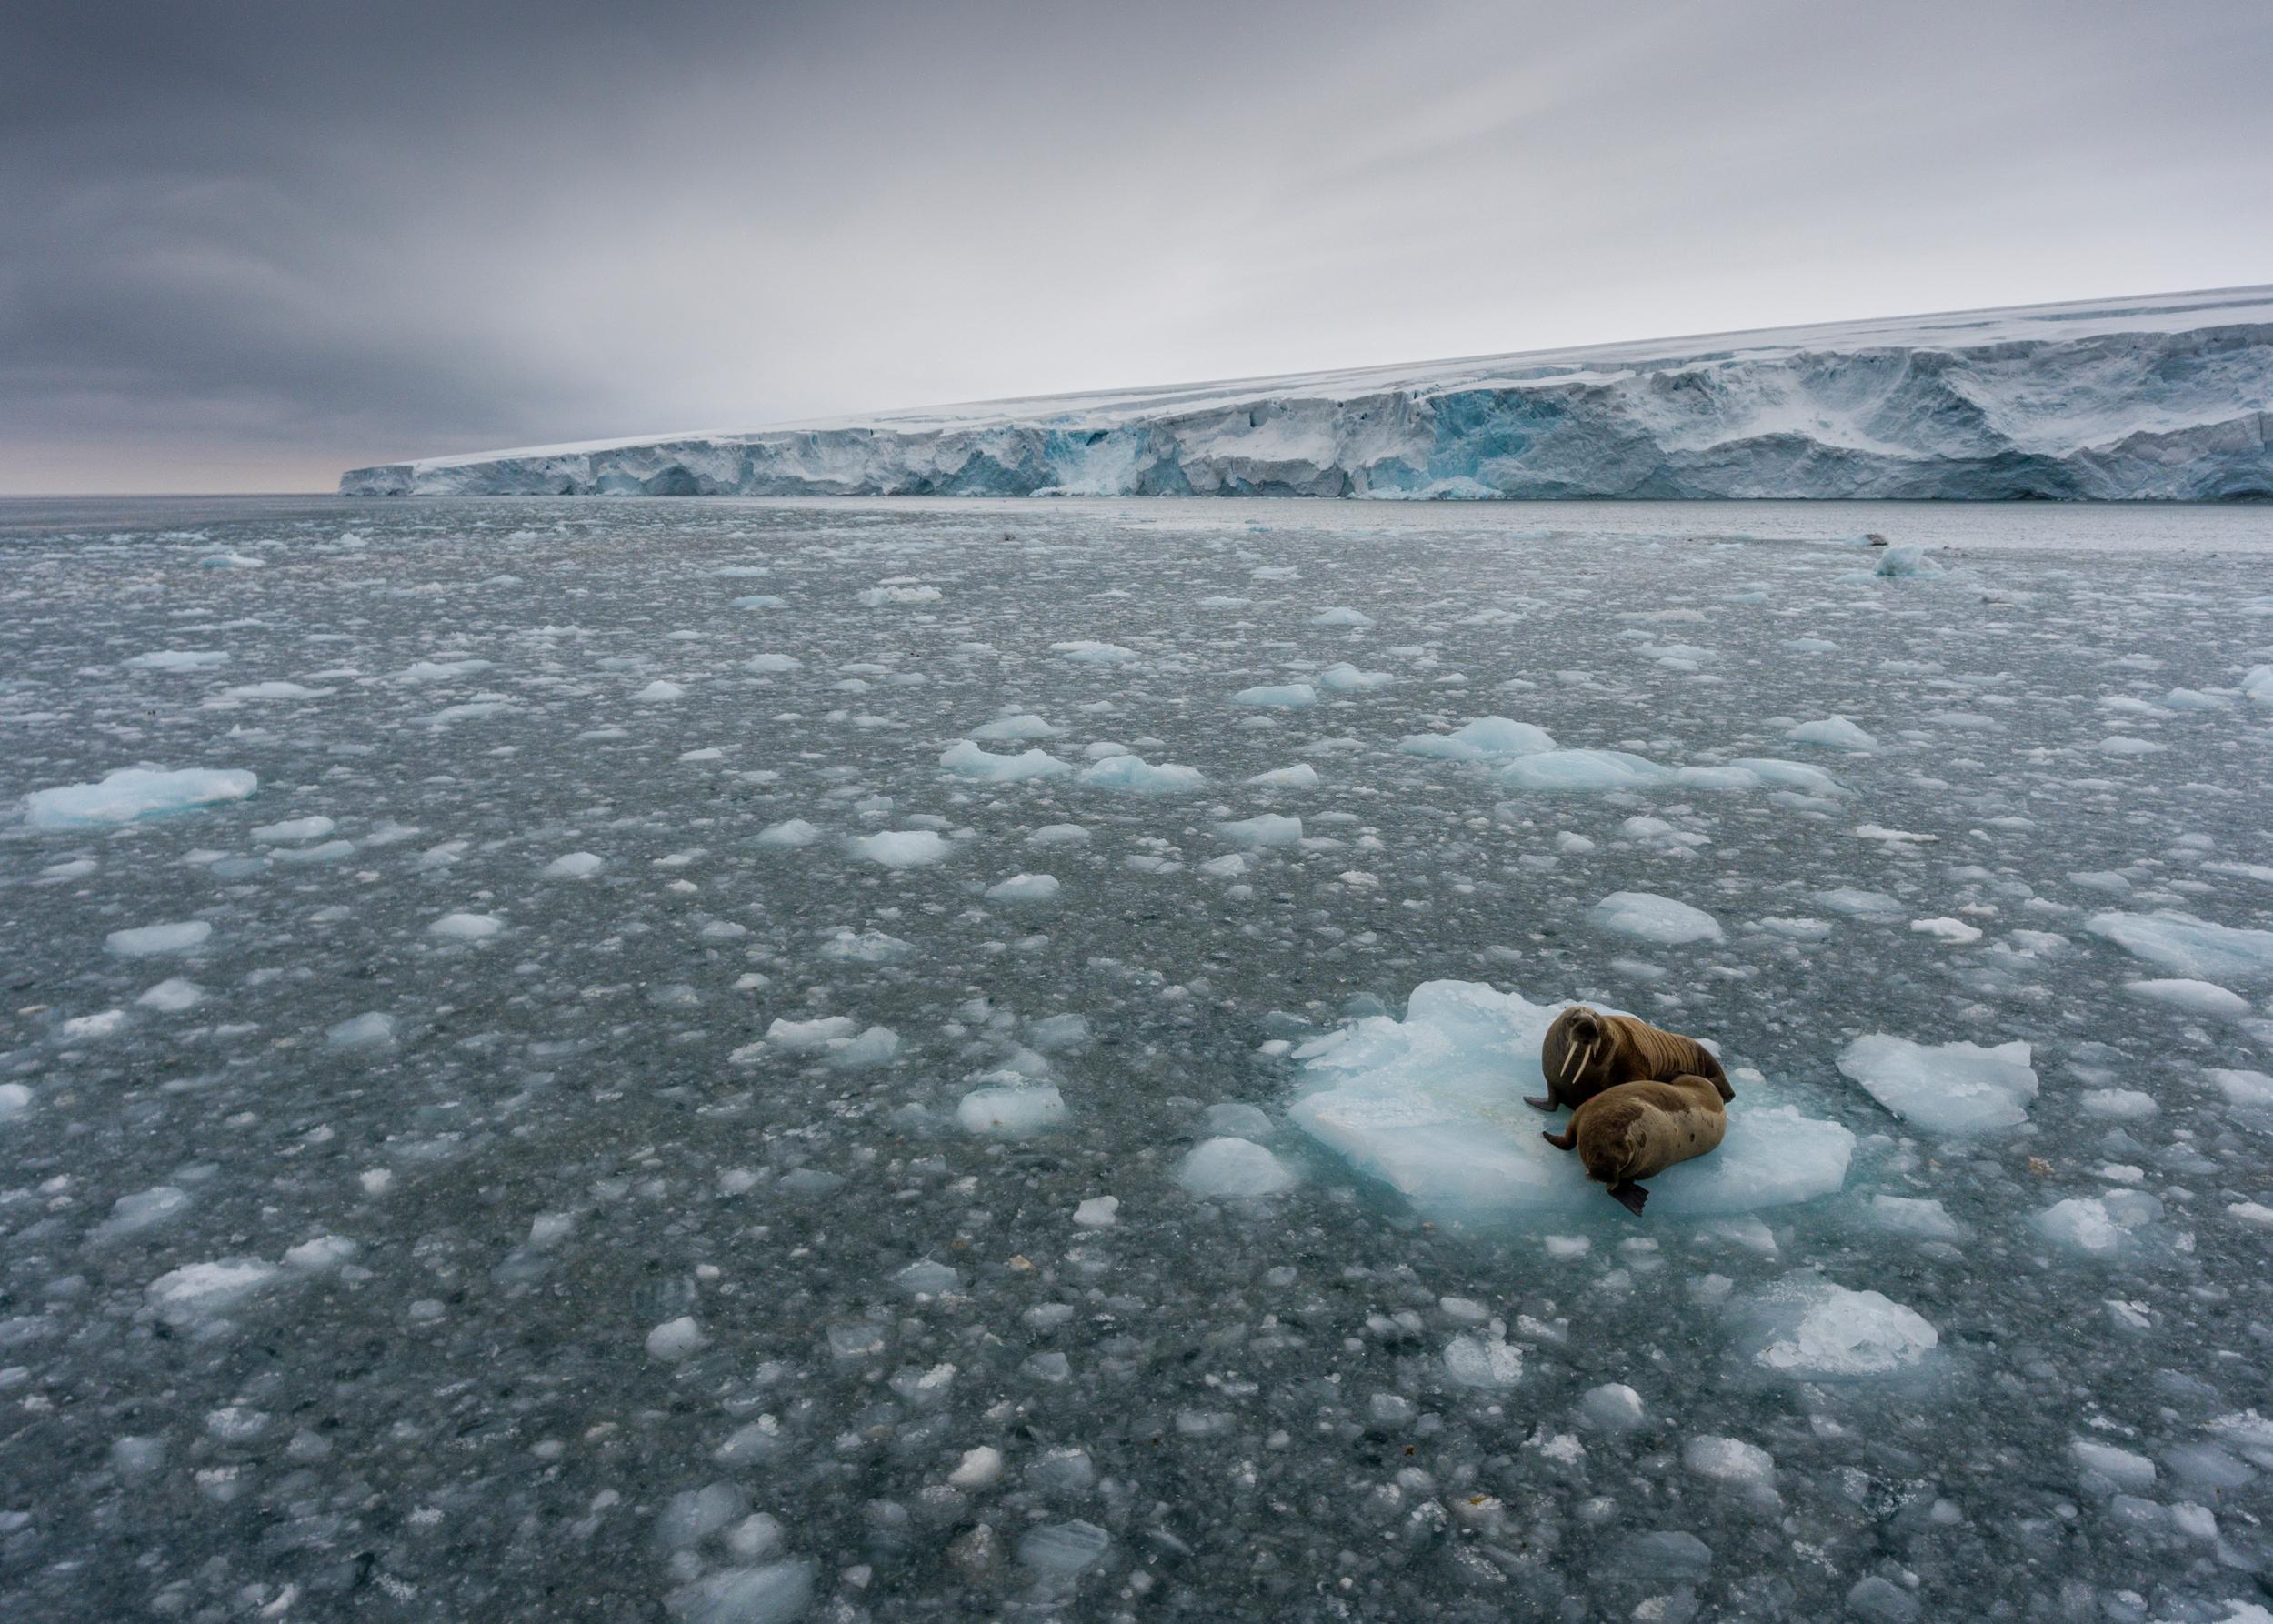 Des morses sur la banquise à Kvitøya à Svalbard © Christian Åslund / Greenpeace